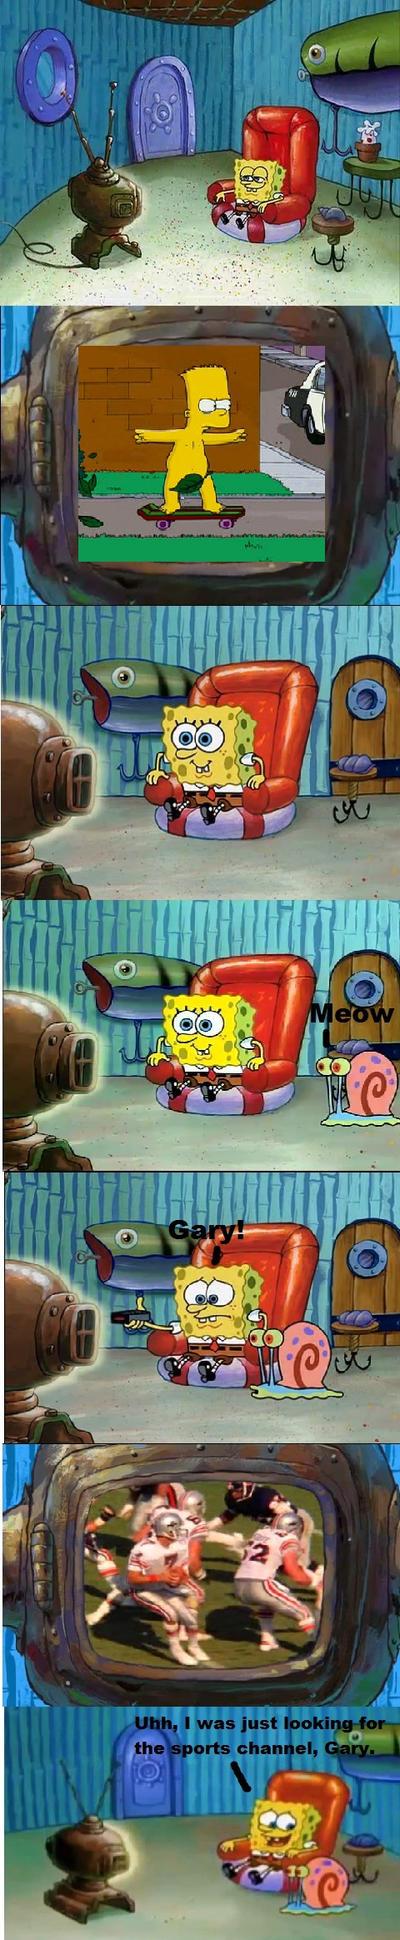 SpongeBob watching Bart Skateboarding Naked by MarcosLucky96